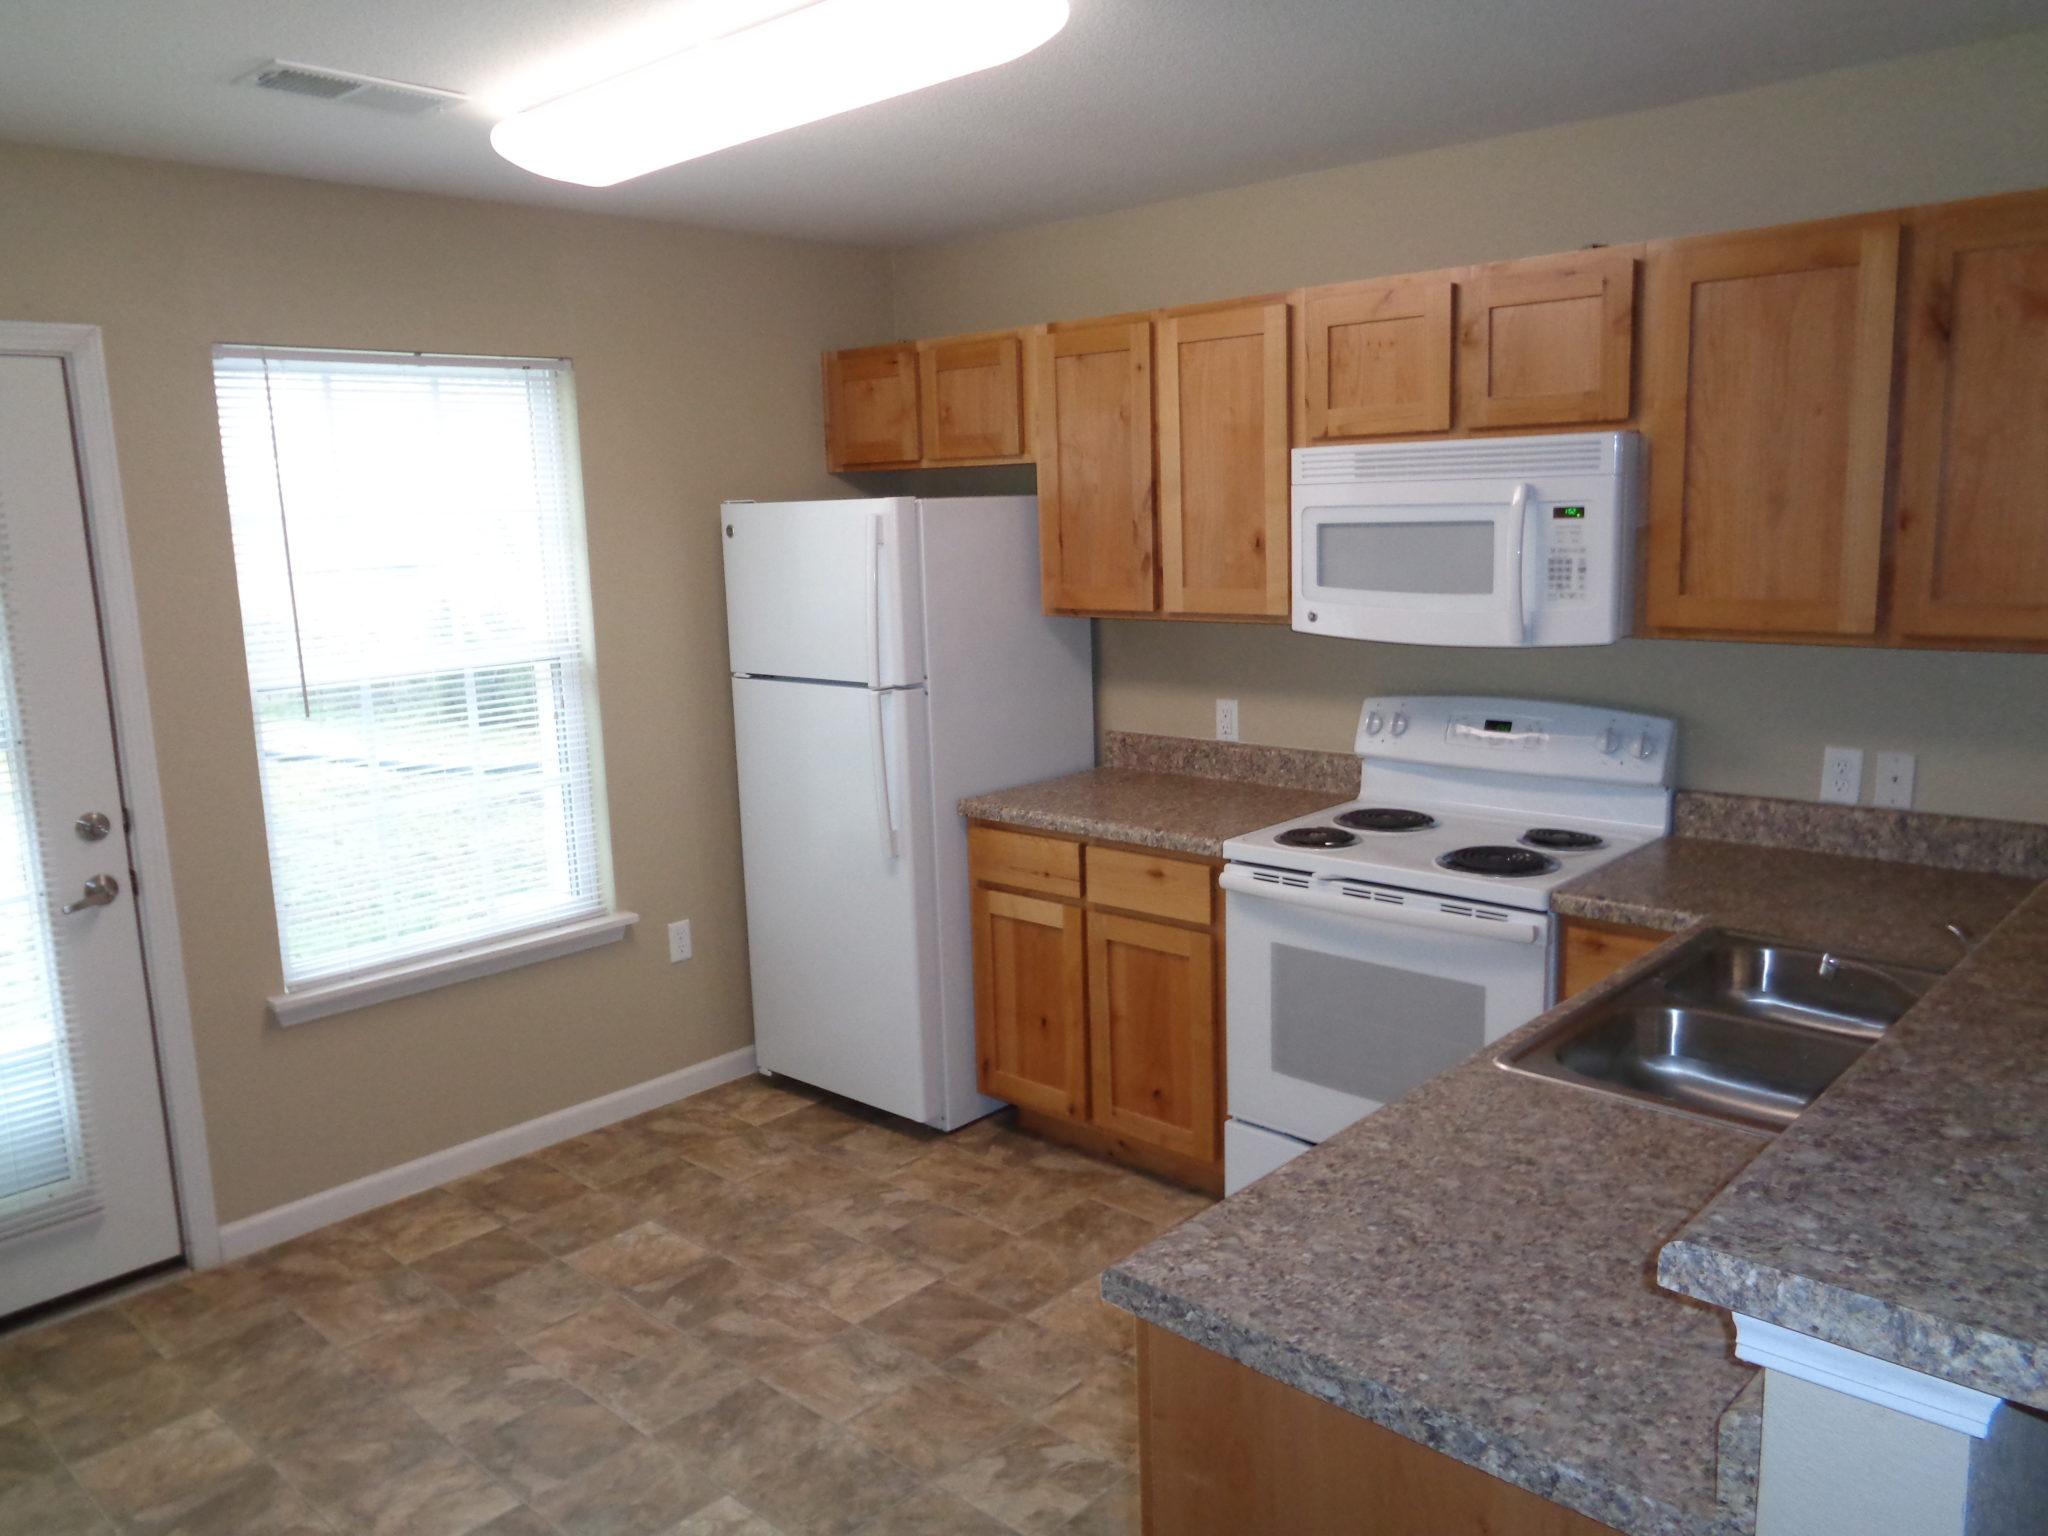 Ridgway Villas Raymore MO kitchen 2